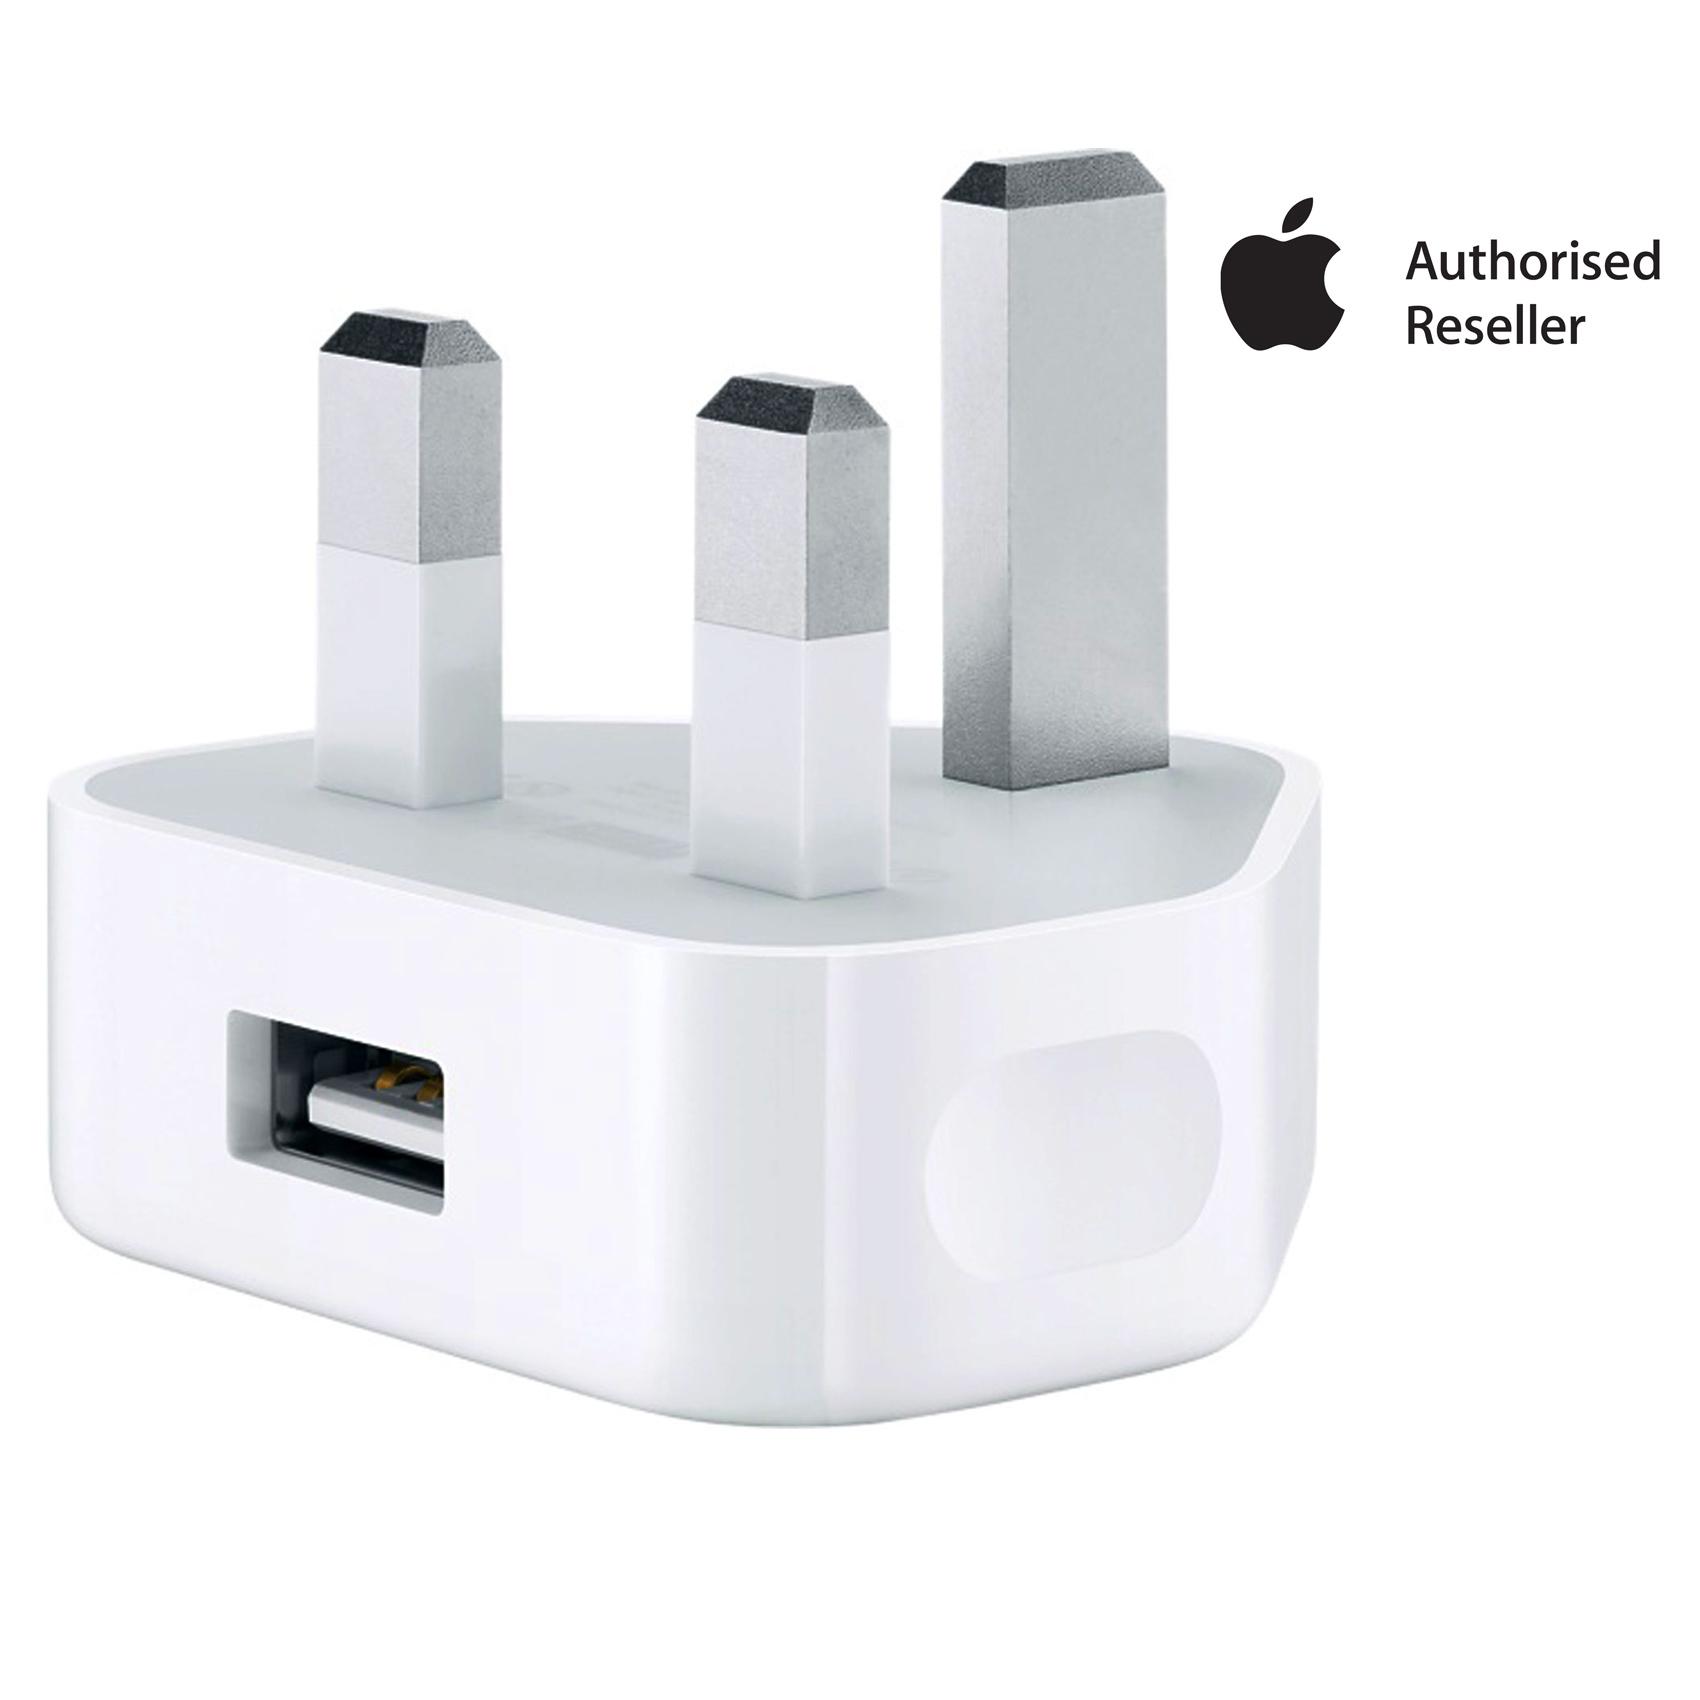 APPLE USB POWER ADAPTER MD812B/C